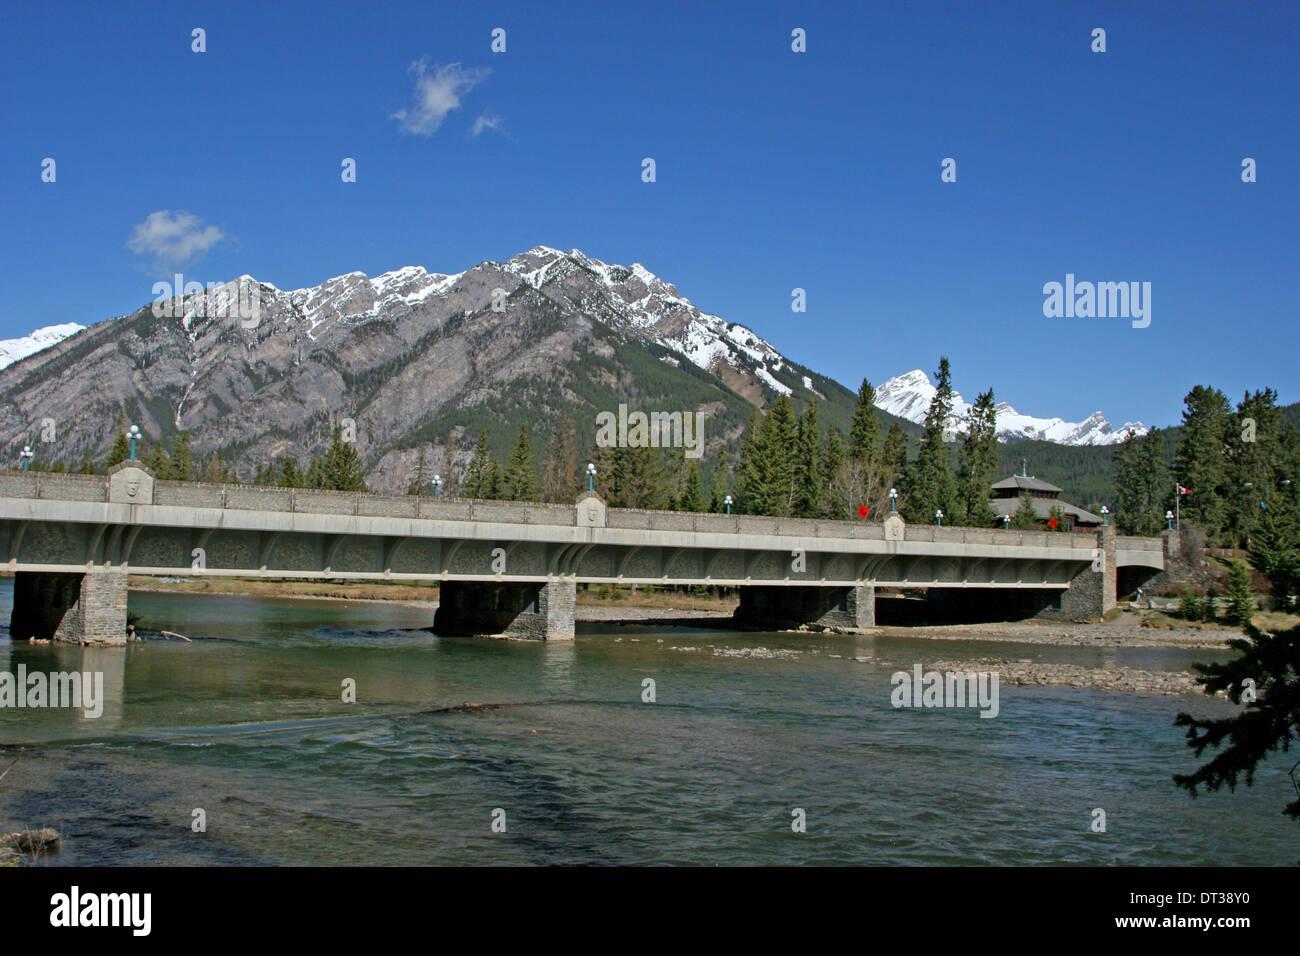 Bow River Bogenbrücke Banff und Bow Falls Banff Nationalpark kanadischen Rocky Mountains Kanada Stockbild